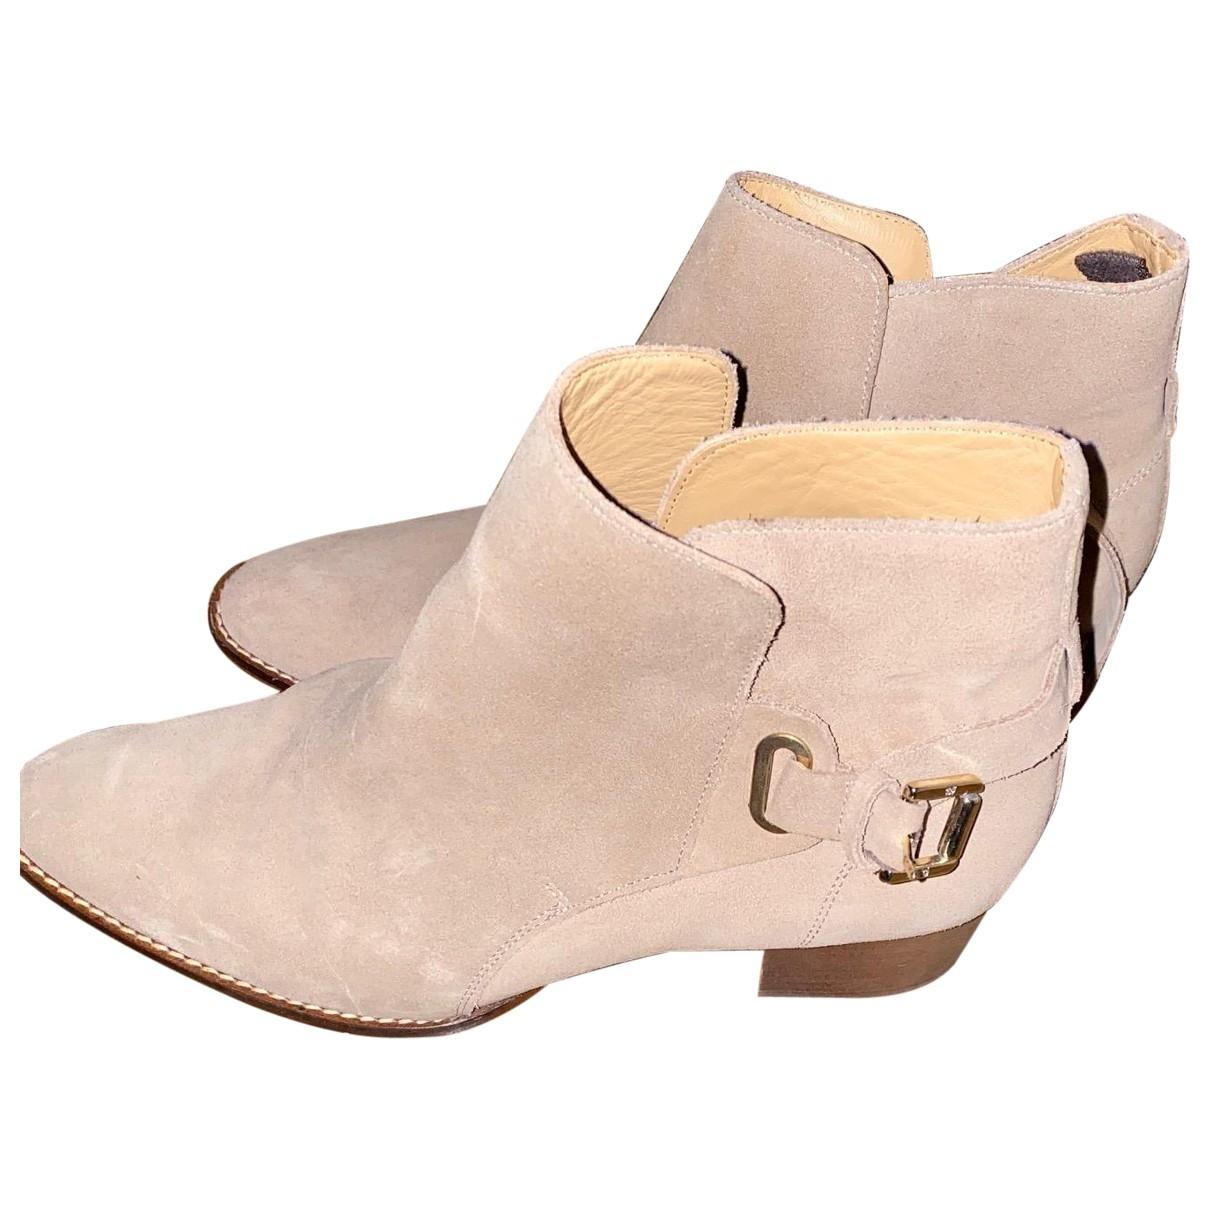 Massimo Dutti \N Ecru Suede Ankle boots for Women 38 EU